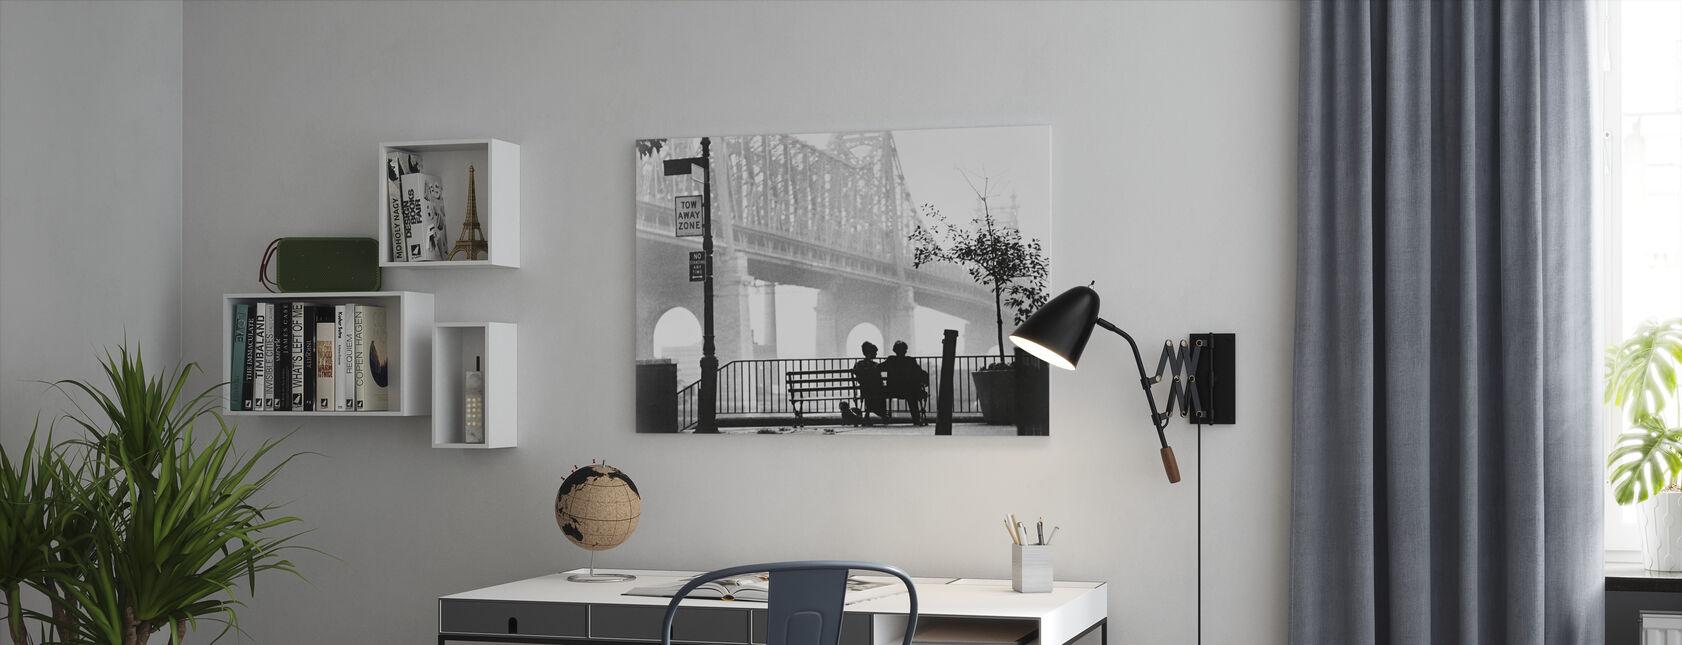 Manhattan - Woody Allen y Diane Keaton - Lienzo - Oficina